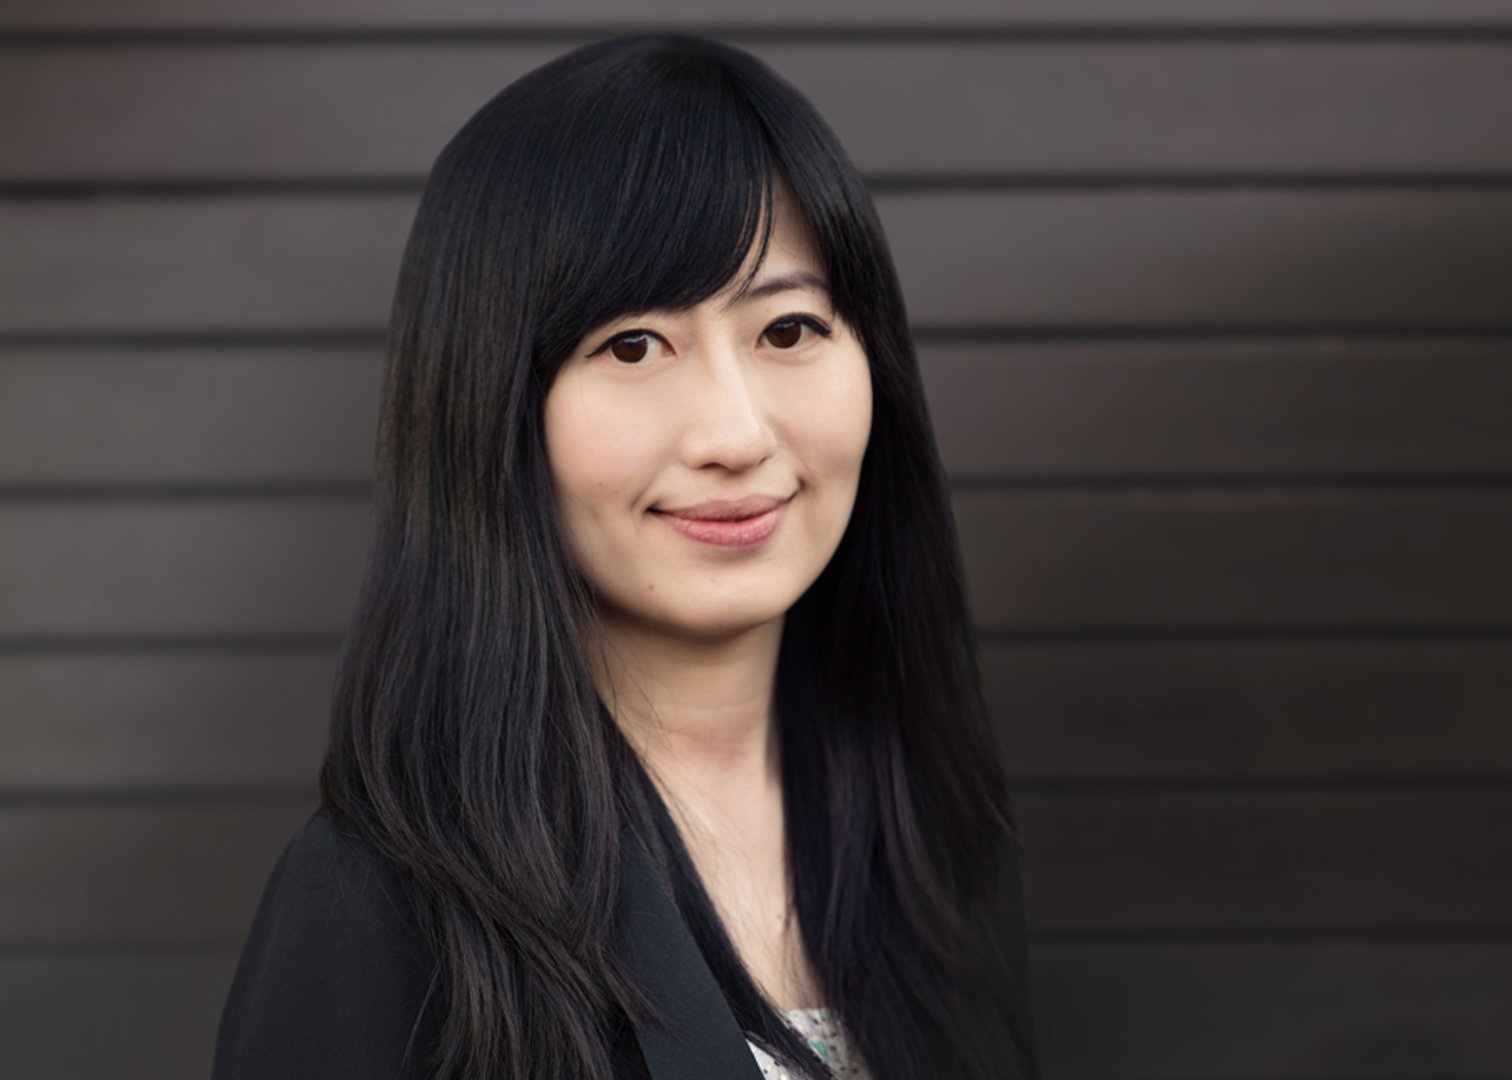 Tina Fu found a fulfilling career in recruitment